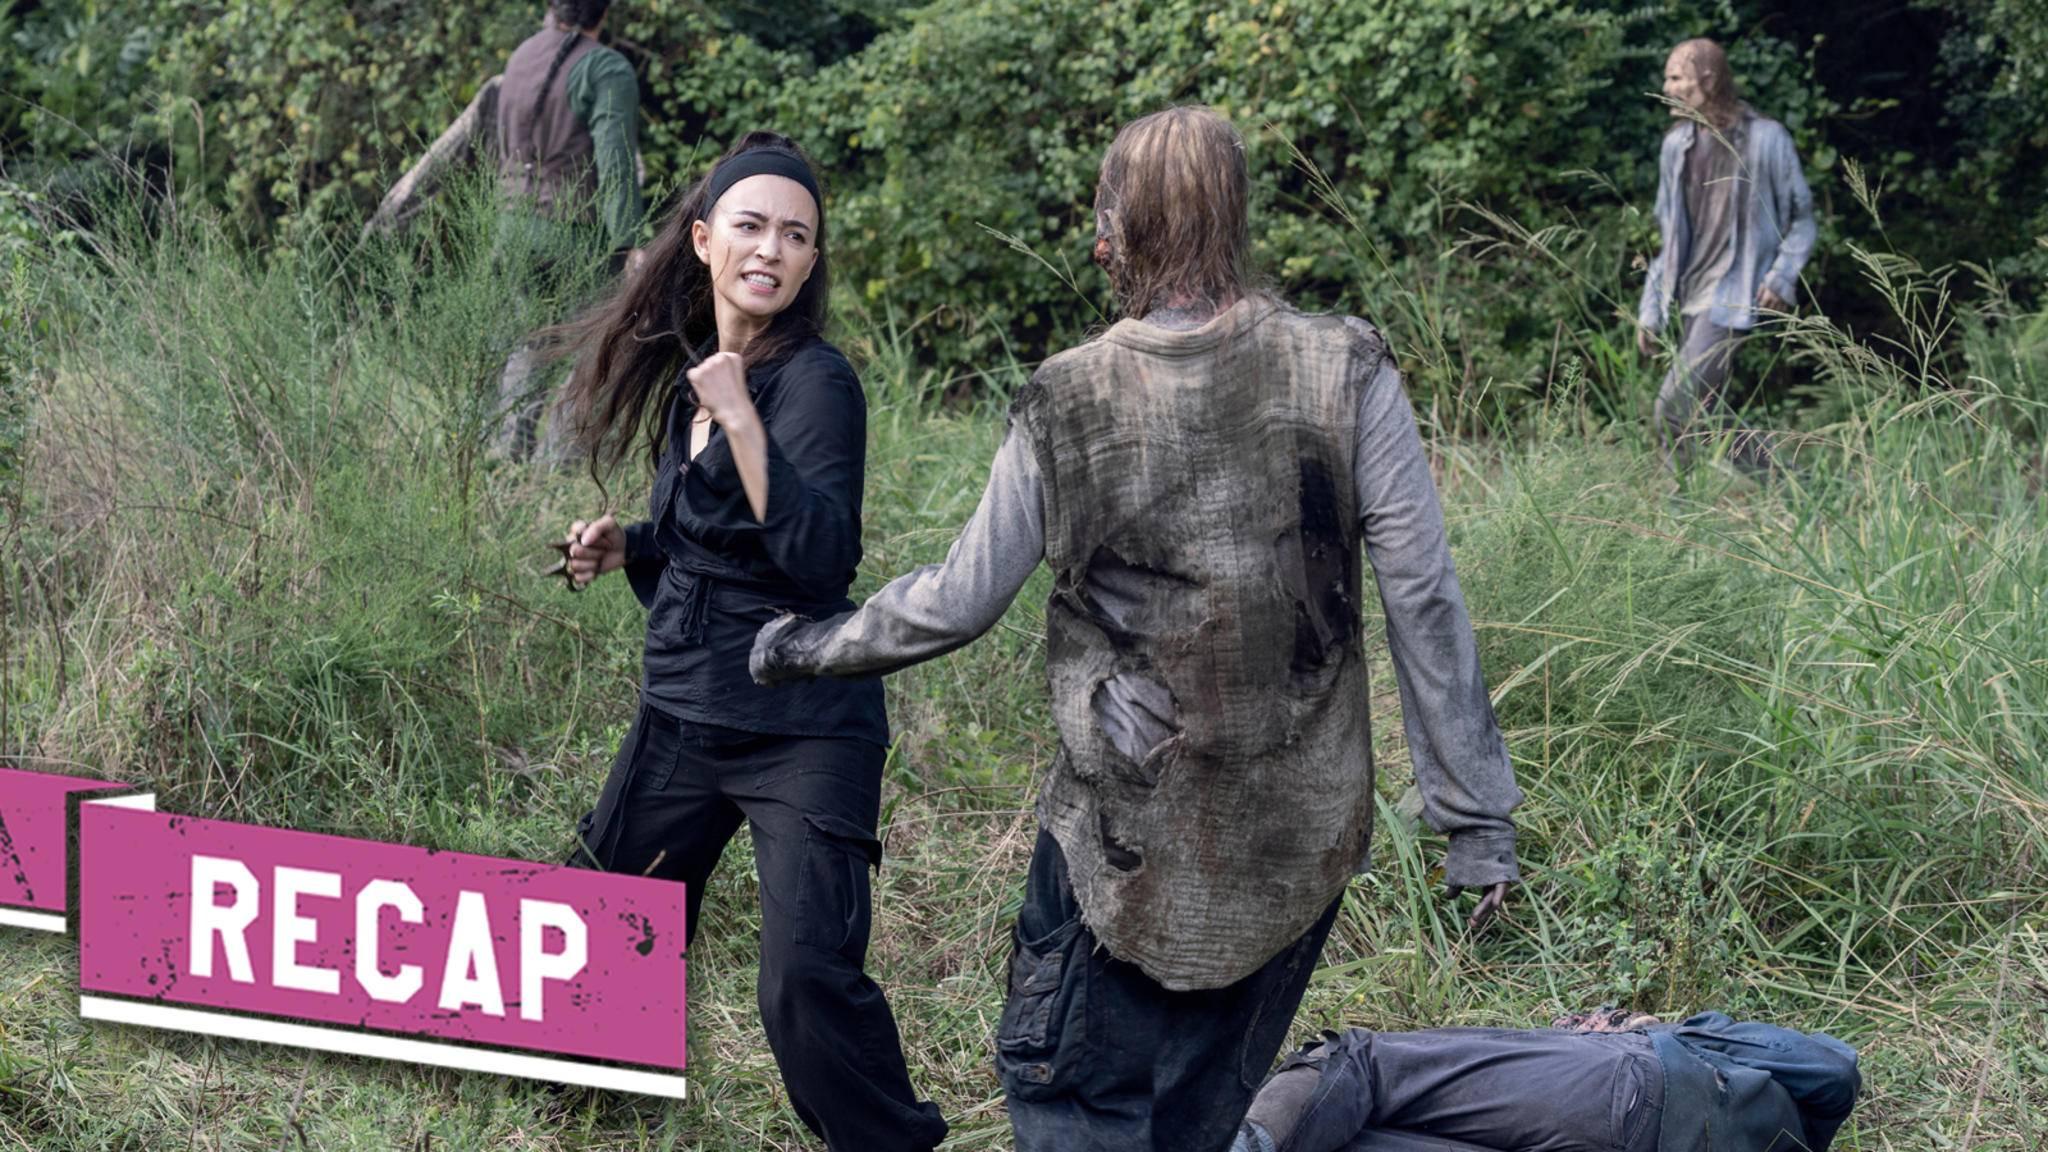 The Walking Dead-S10E08-Rosita-Jace Downs-AMC-Teaserbild